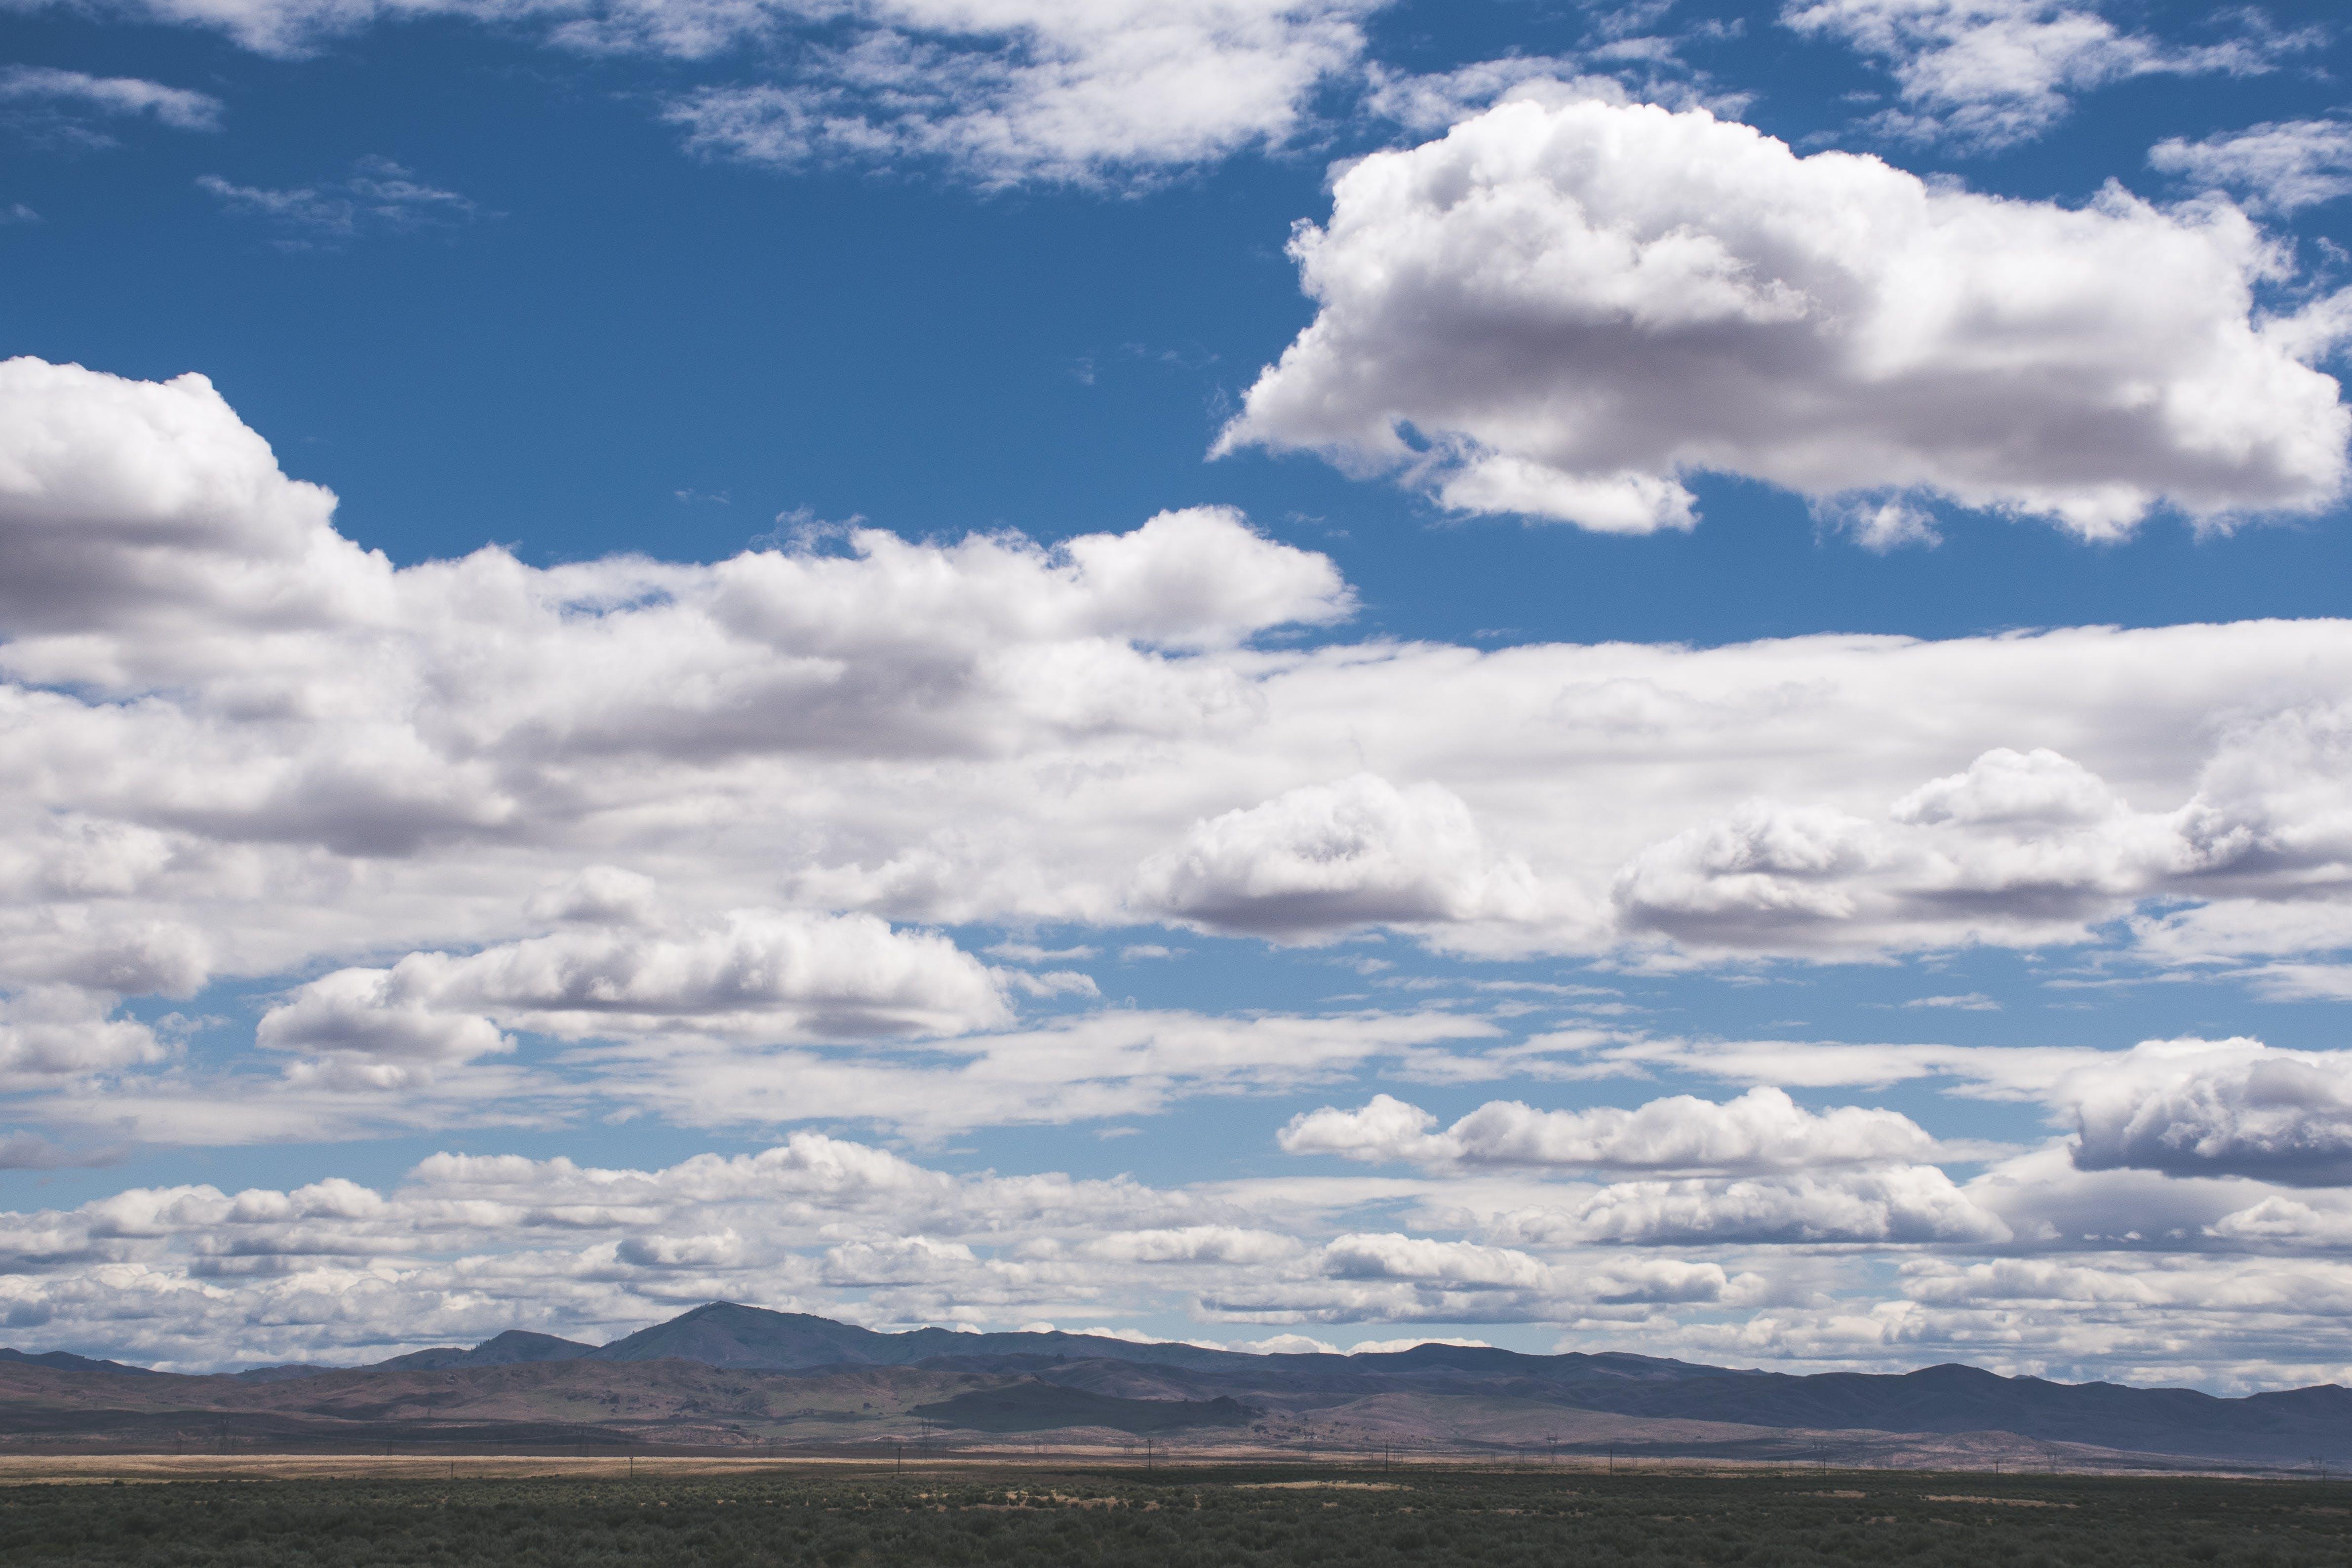 clouds, cloudy, cloudy sky